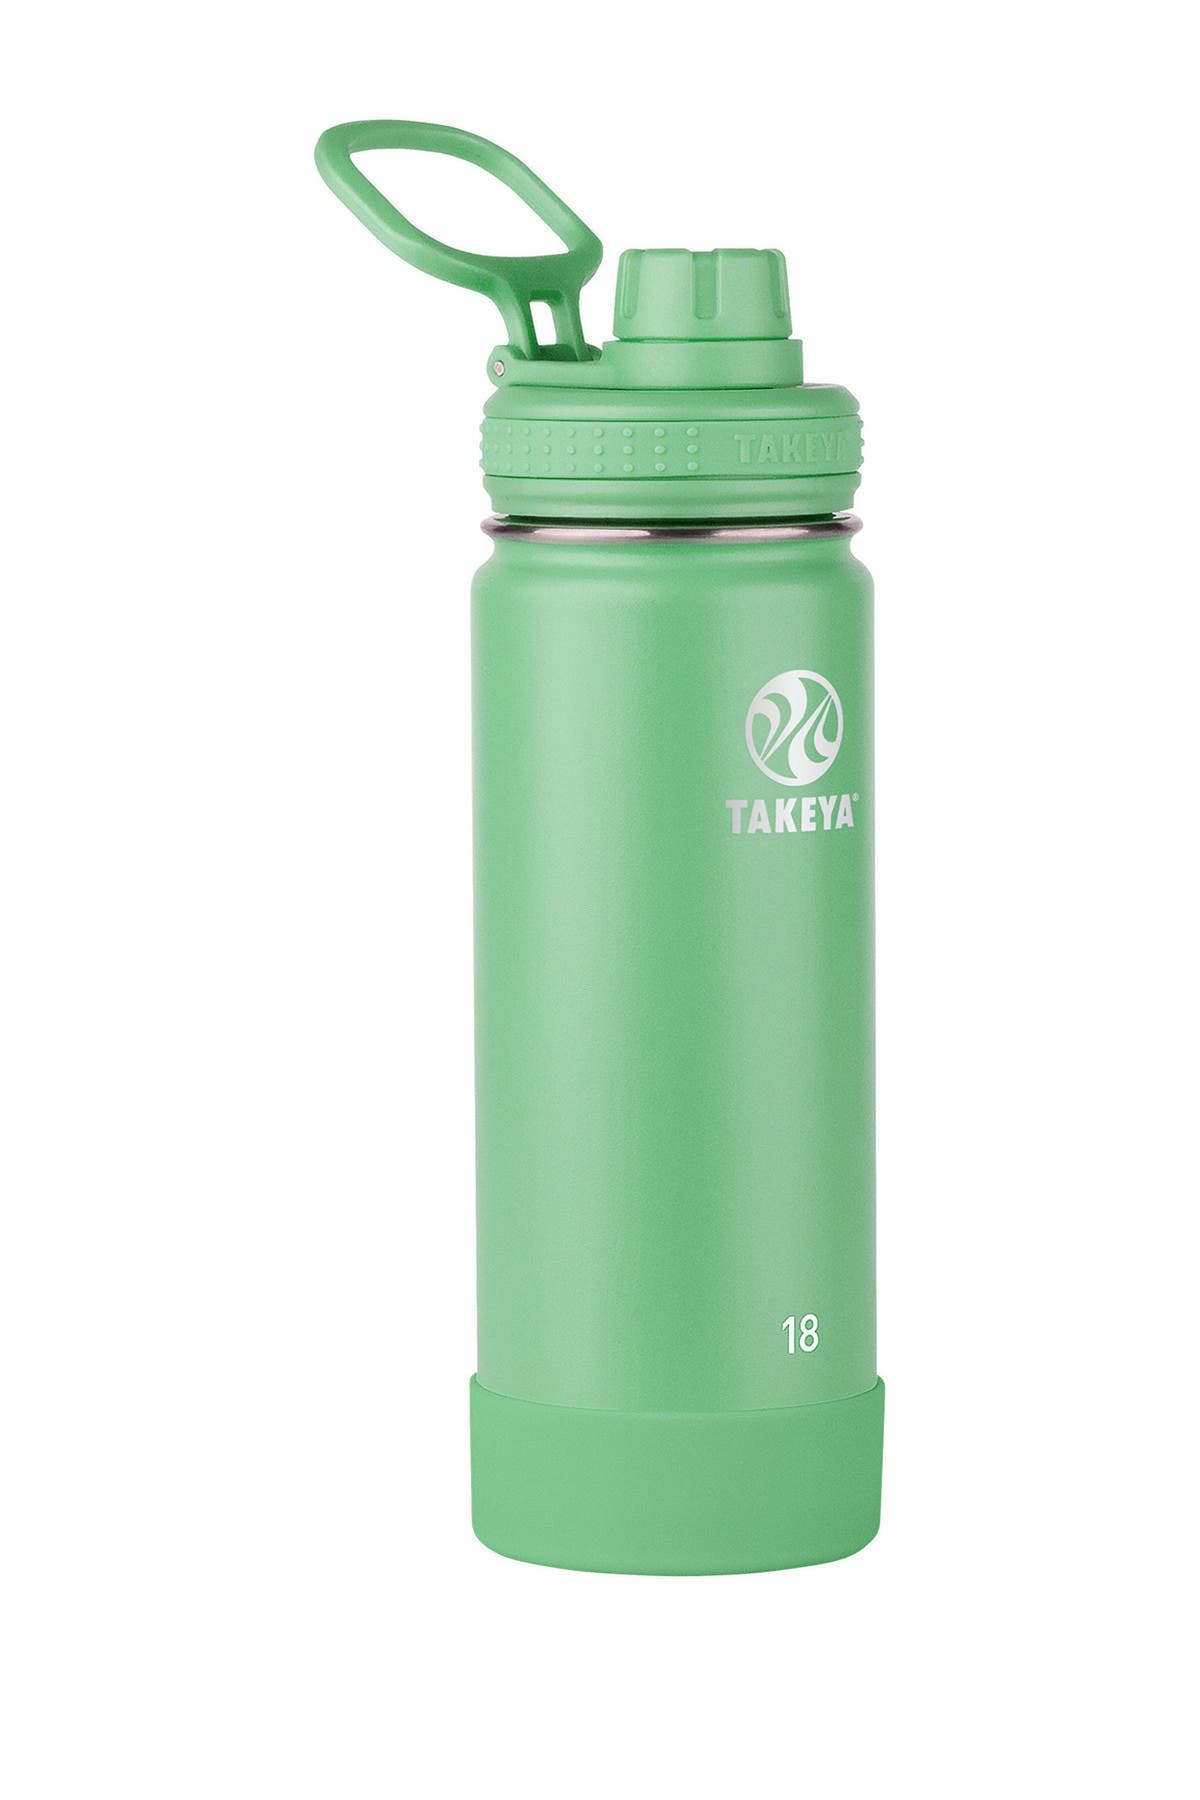 Image of Takeya Actives 18 oz. Spout Bottle - Mint